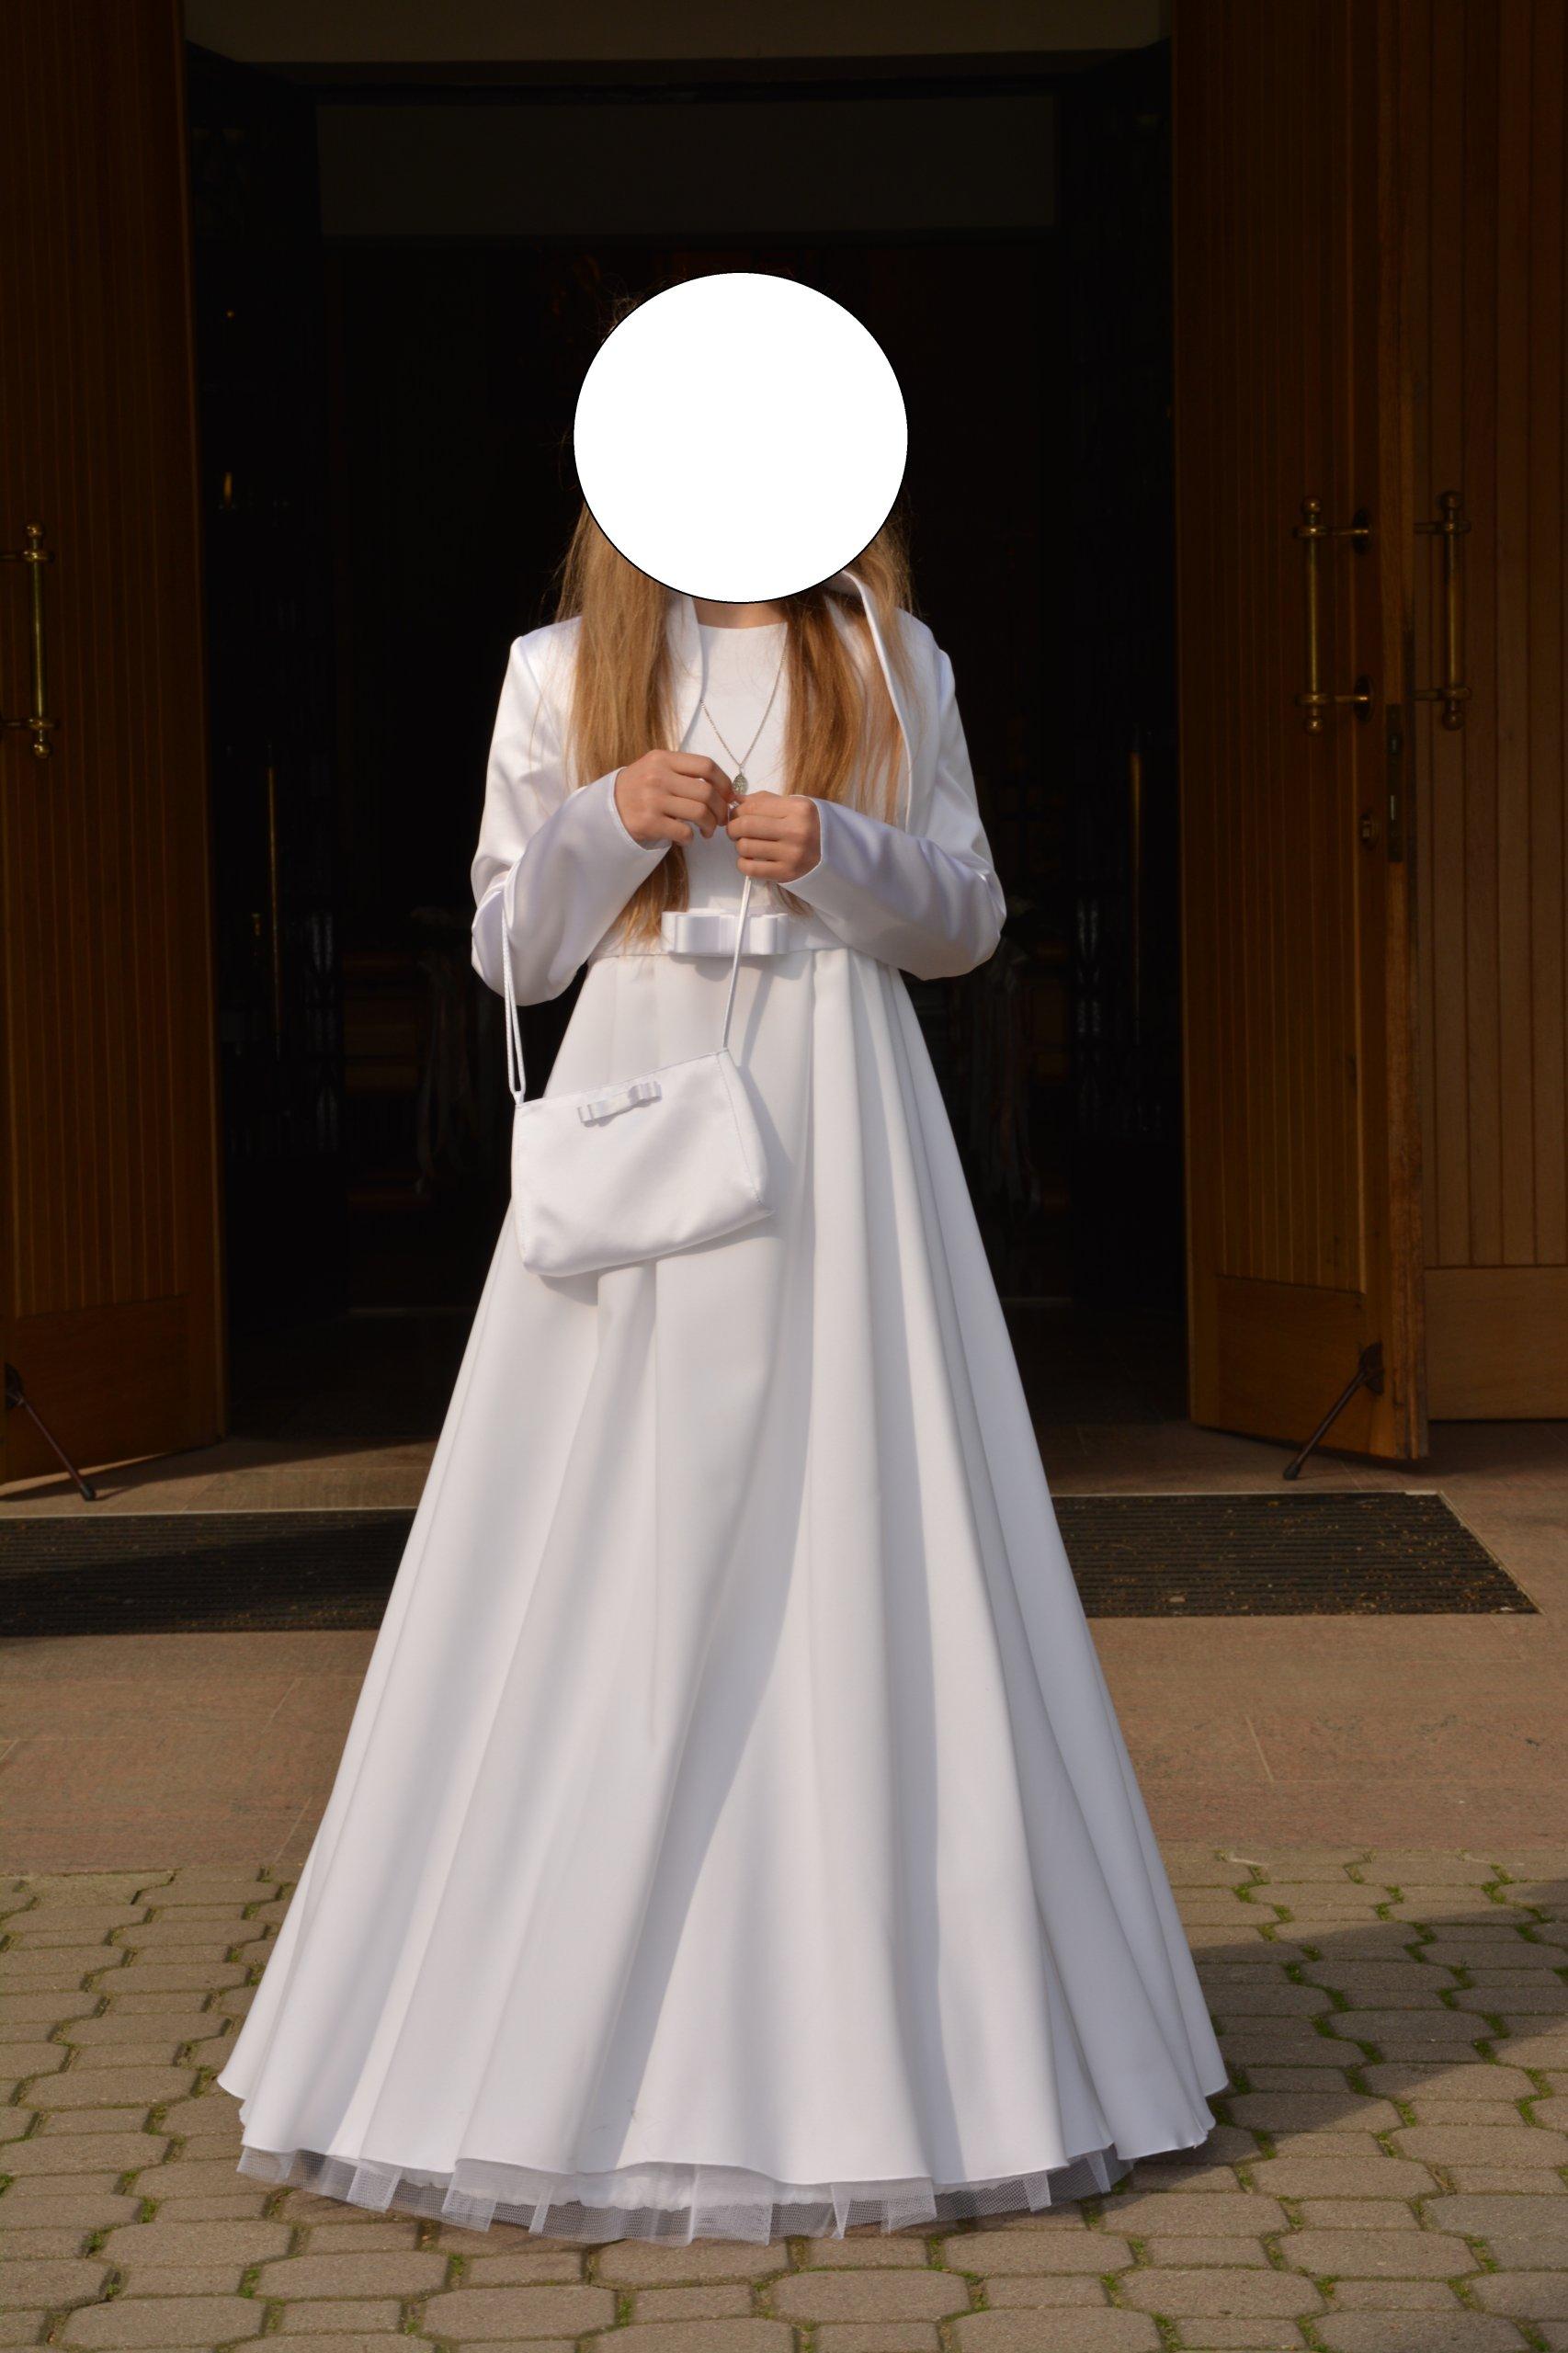 657ddec01f Sukienka komunijna IZA Emmi Mariage rozm.134 140 - 7243511692 ...